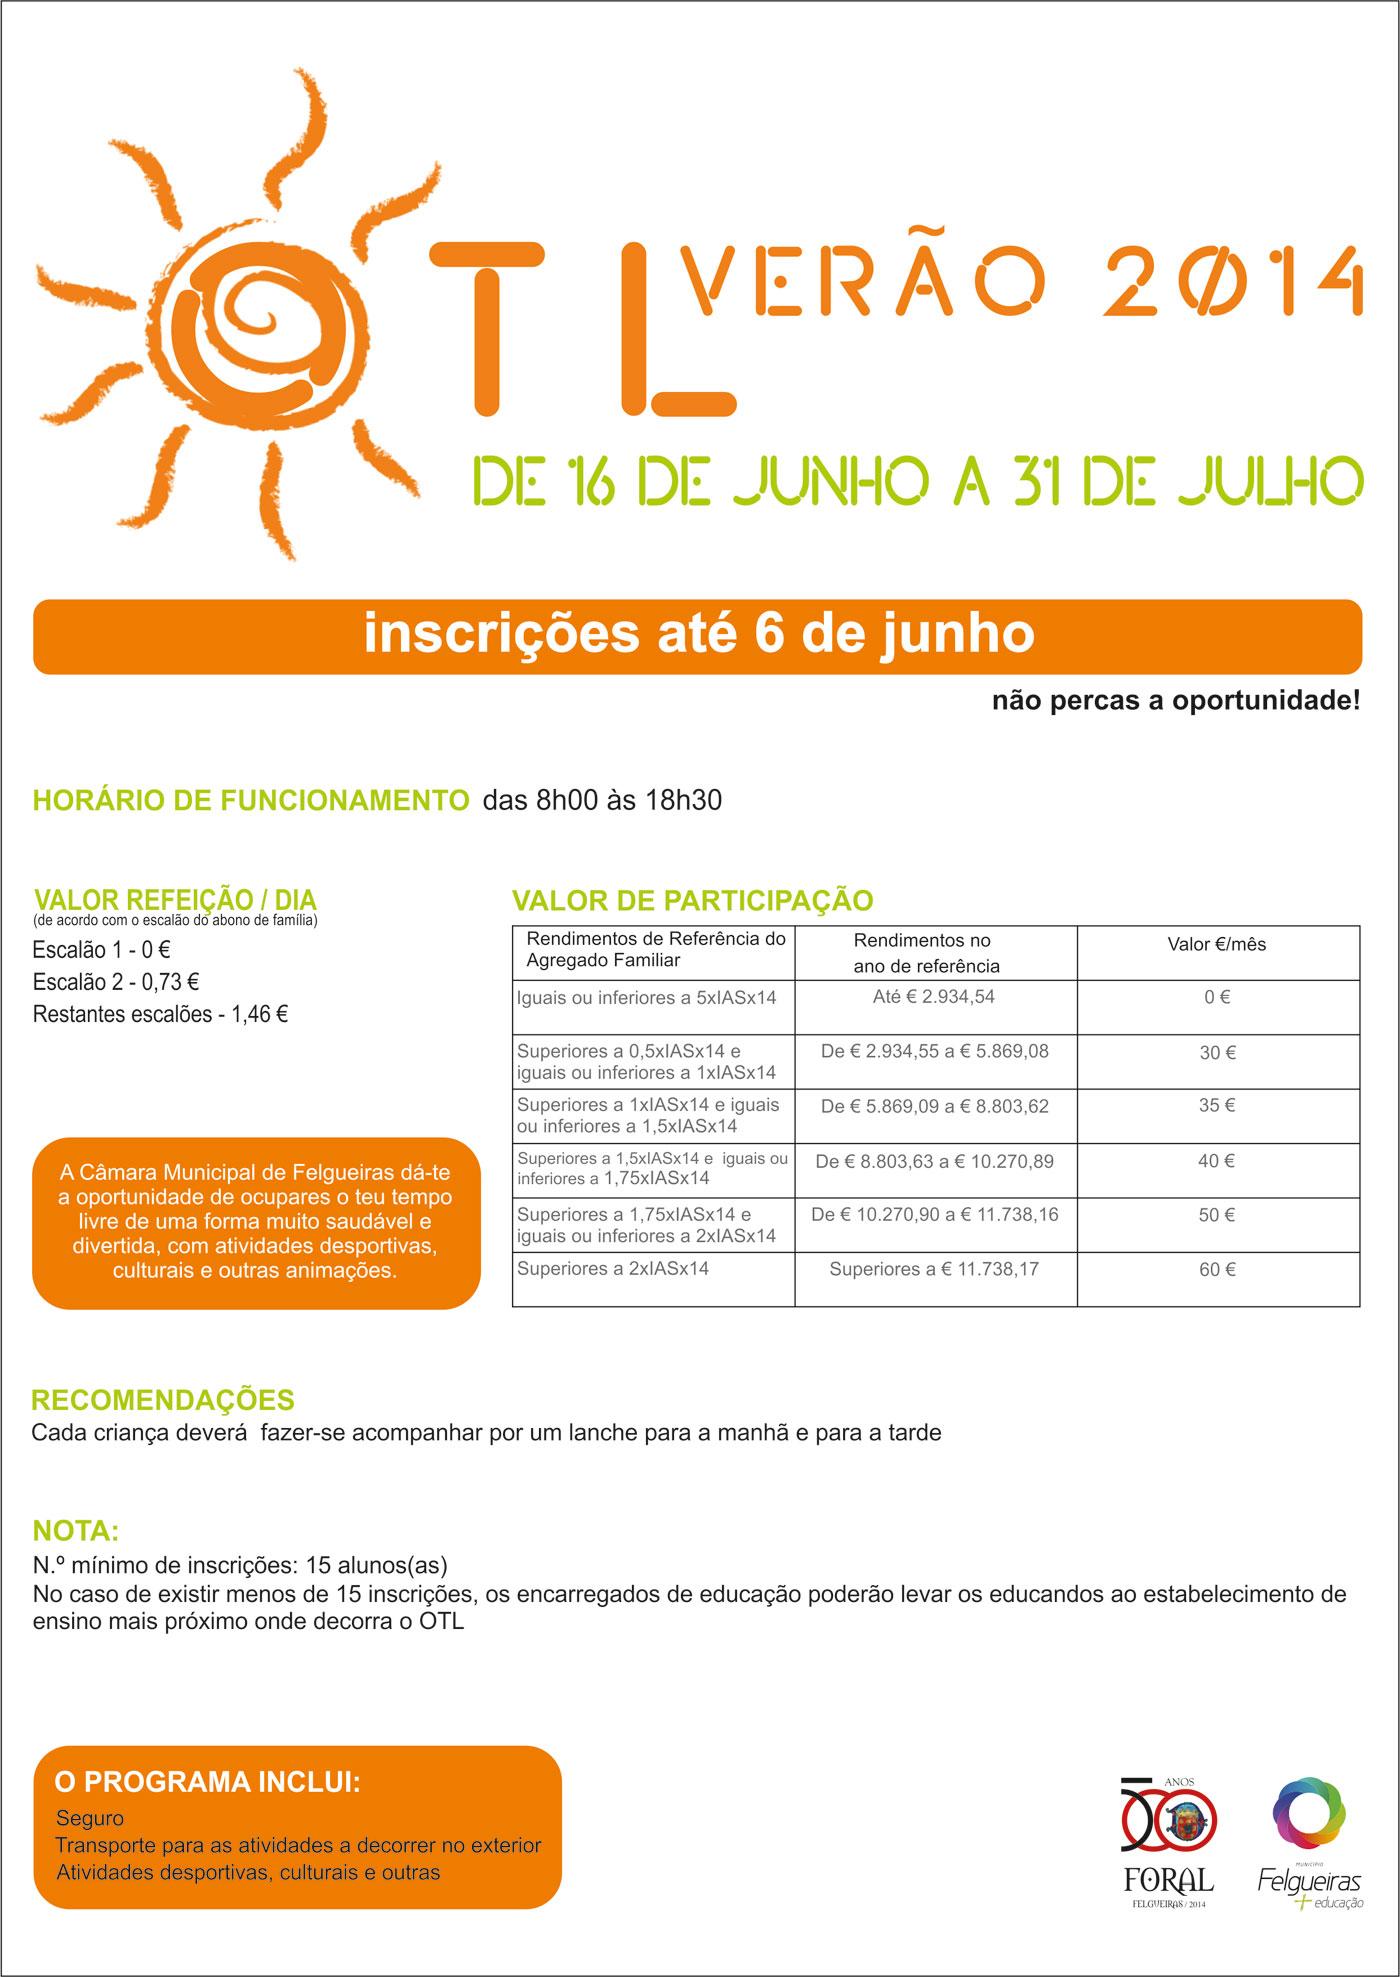 cartaz-OTL-Verão-2014_w